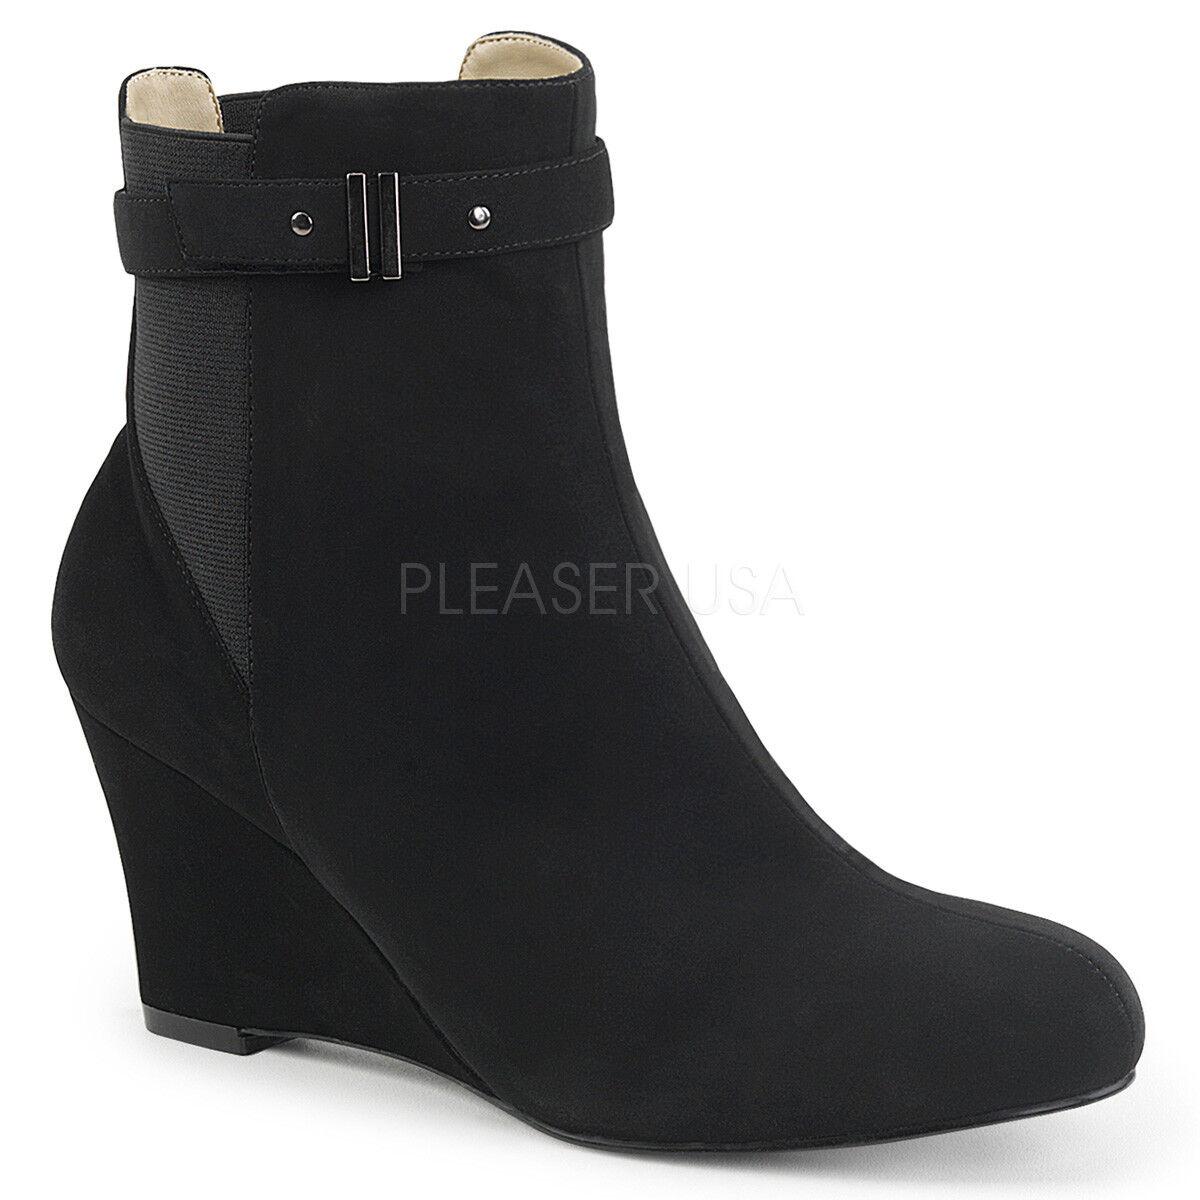 Suede Ankle Stiefel Wedges Mens Crossdresser Large Größe Womans Schuhes Größe 11 12 13